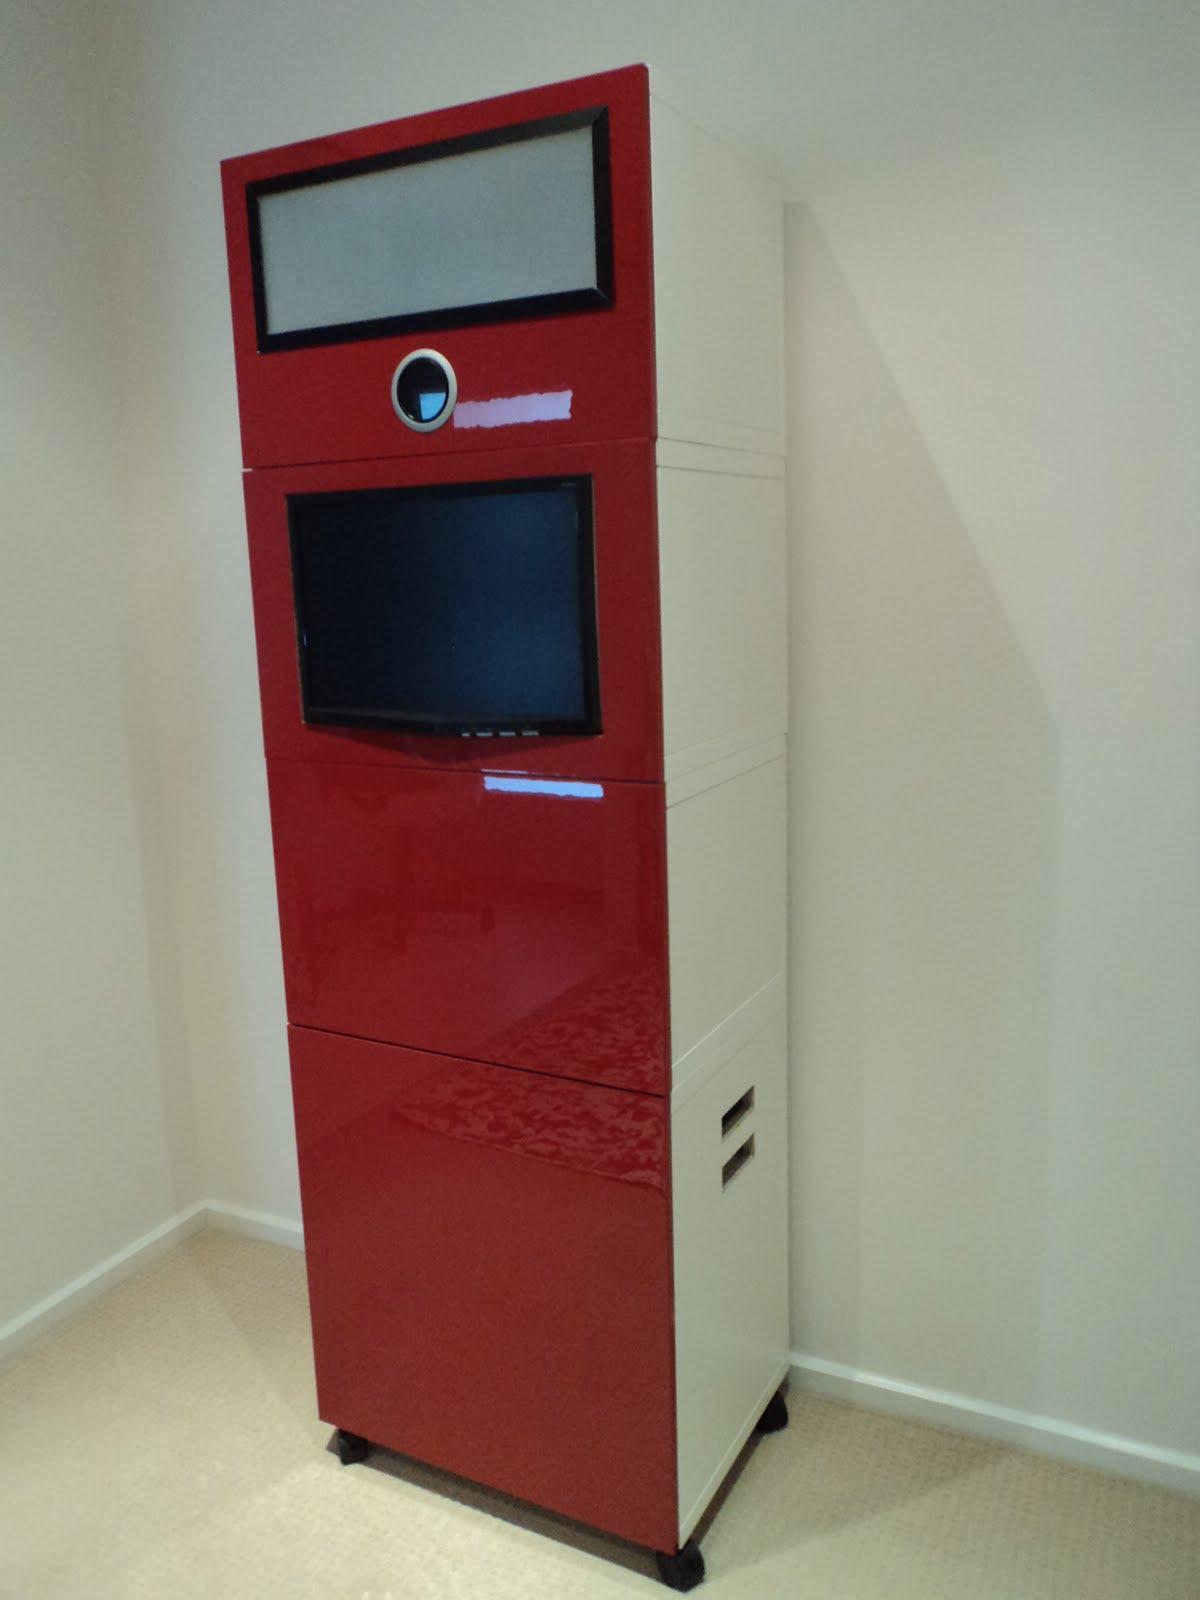 The Besta photobooth - IKEA Hackers - IKEA Hackers